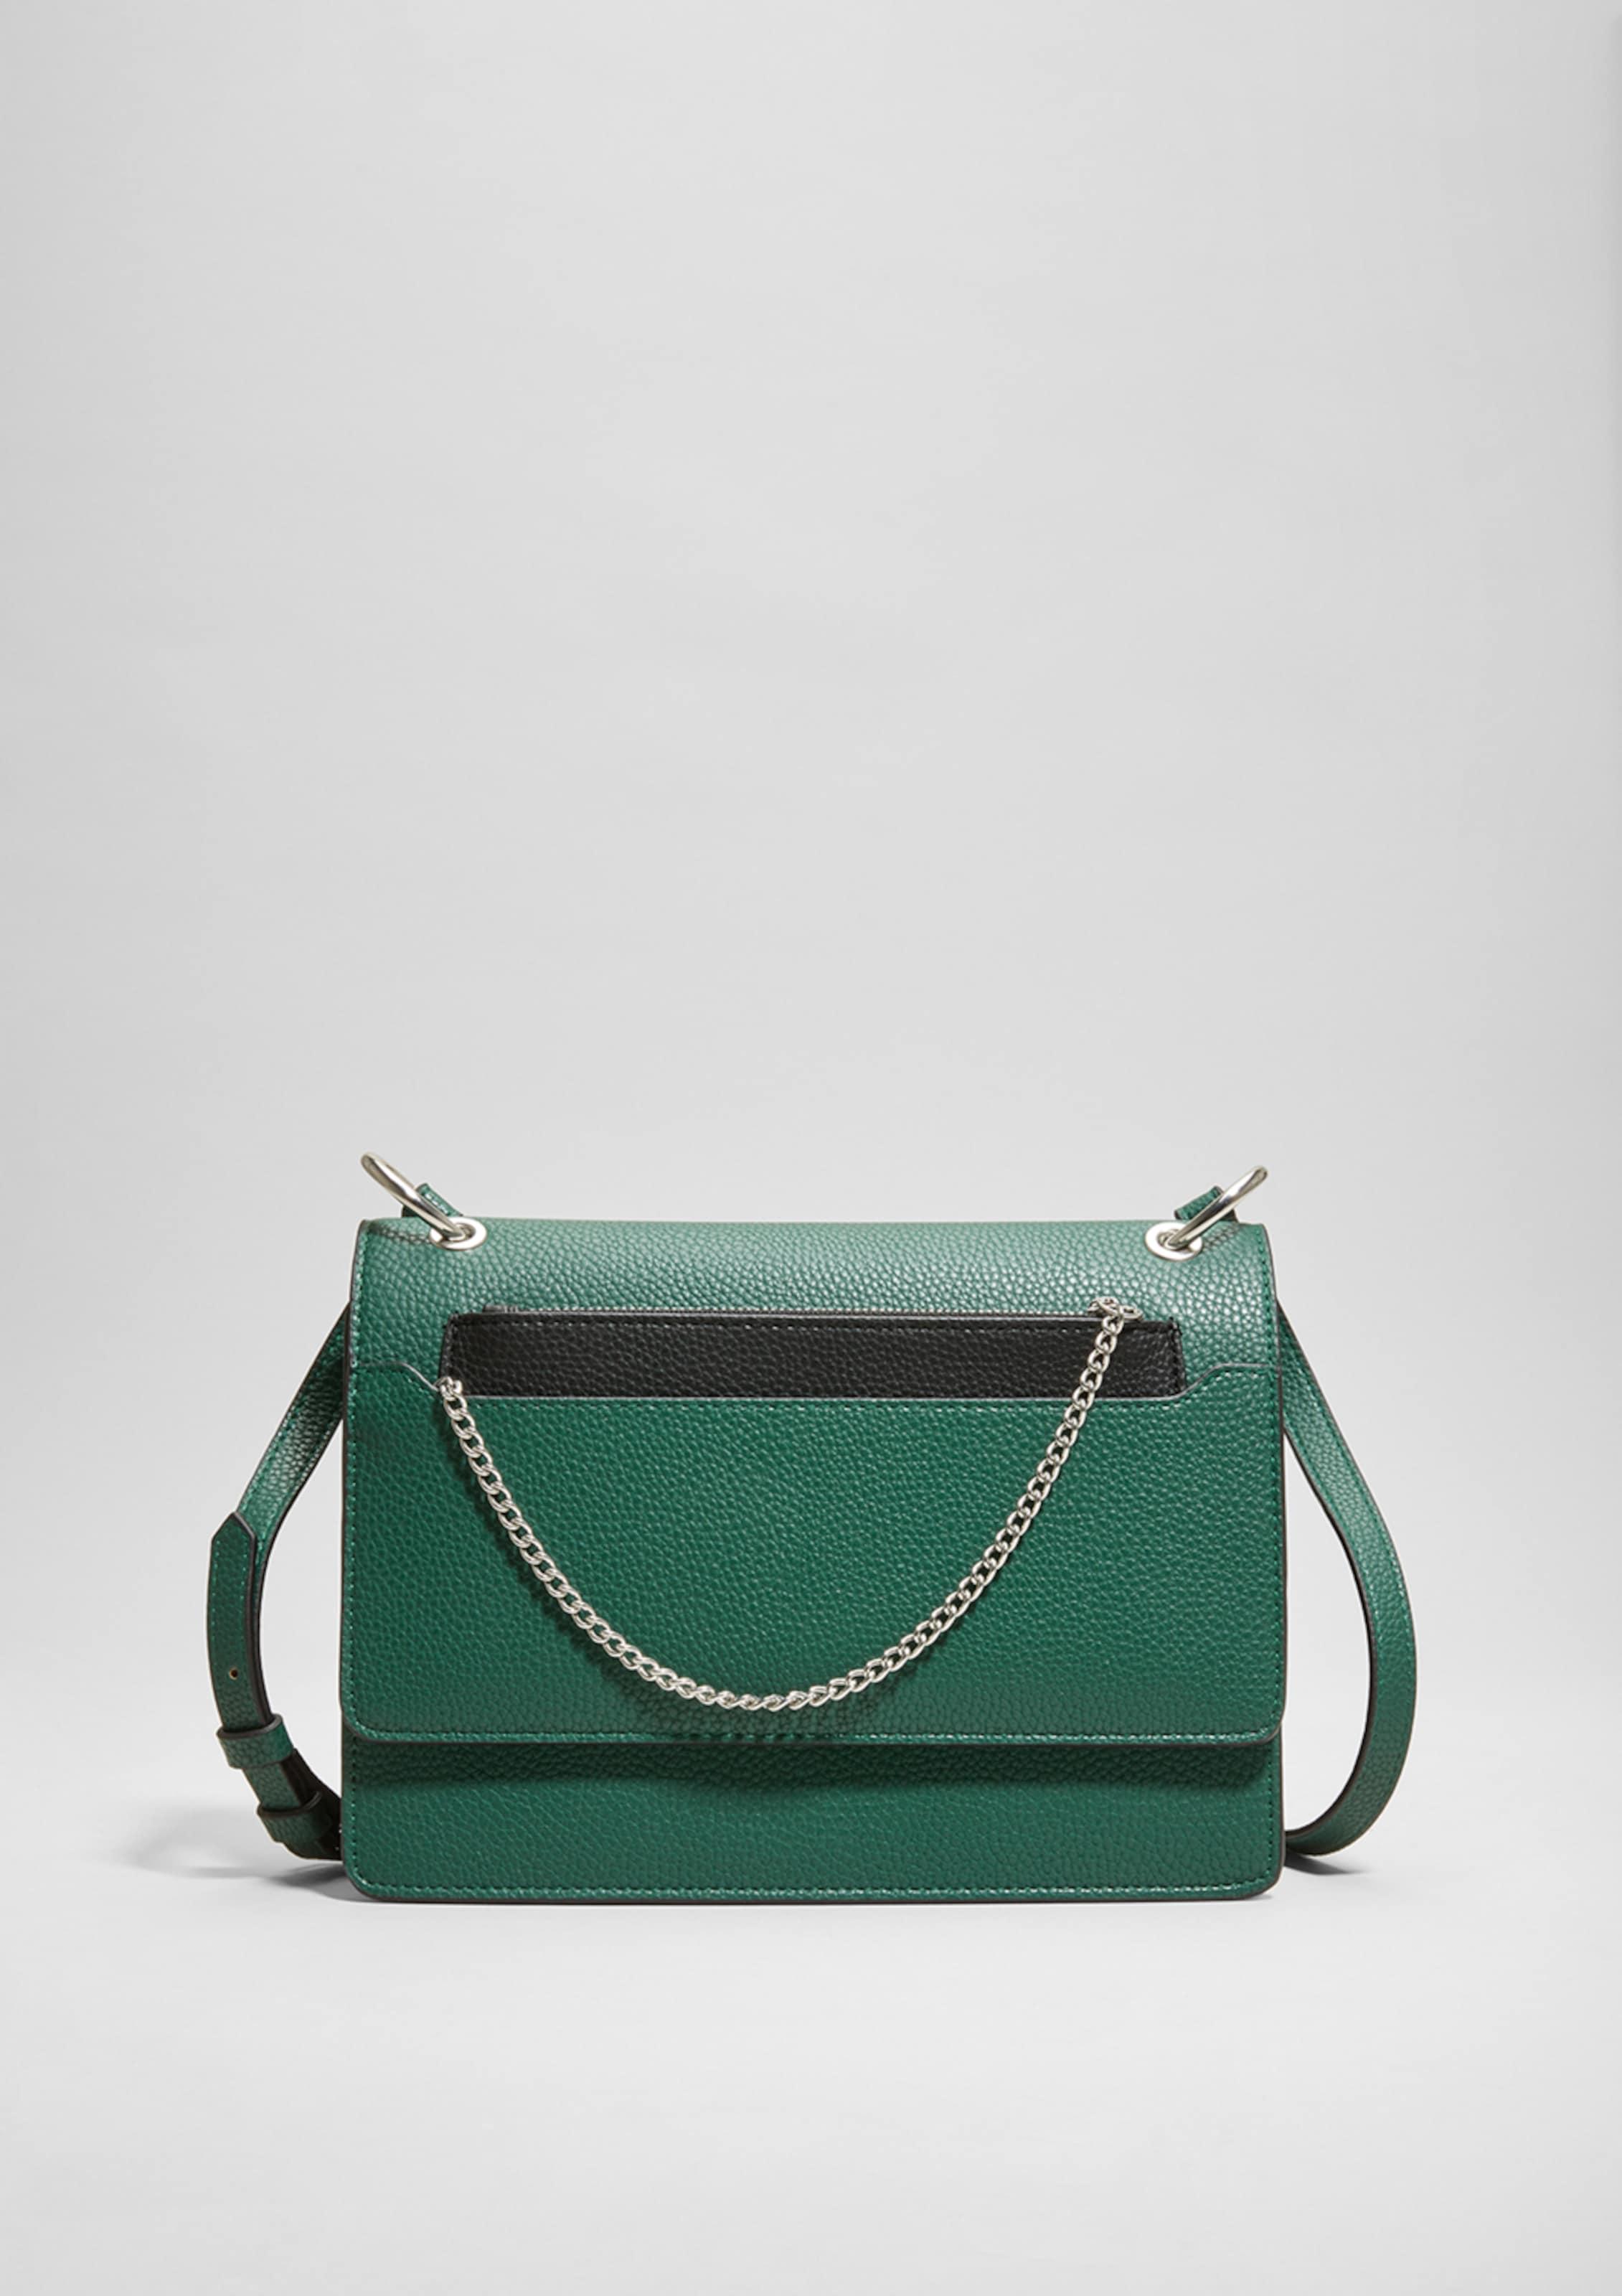 City Bag oliver Grün Mit In Kettendetail S HYeWE2I9D